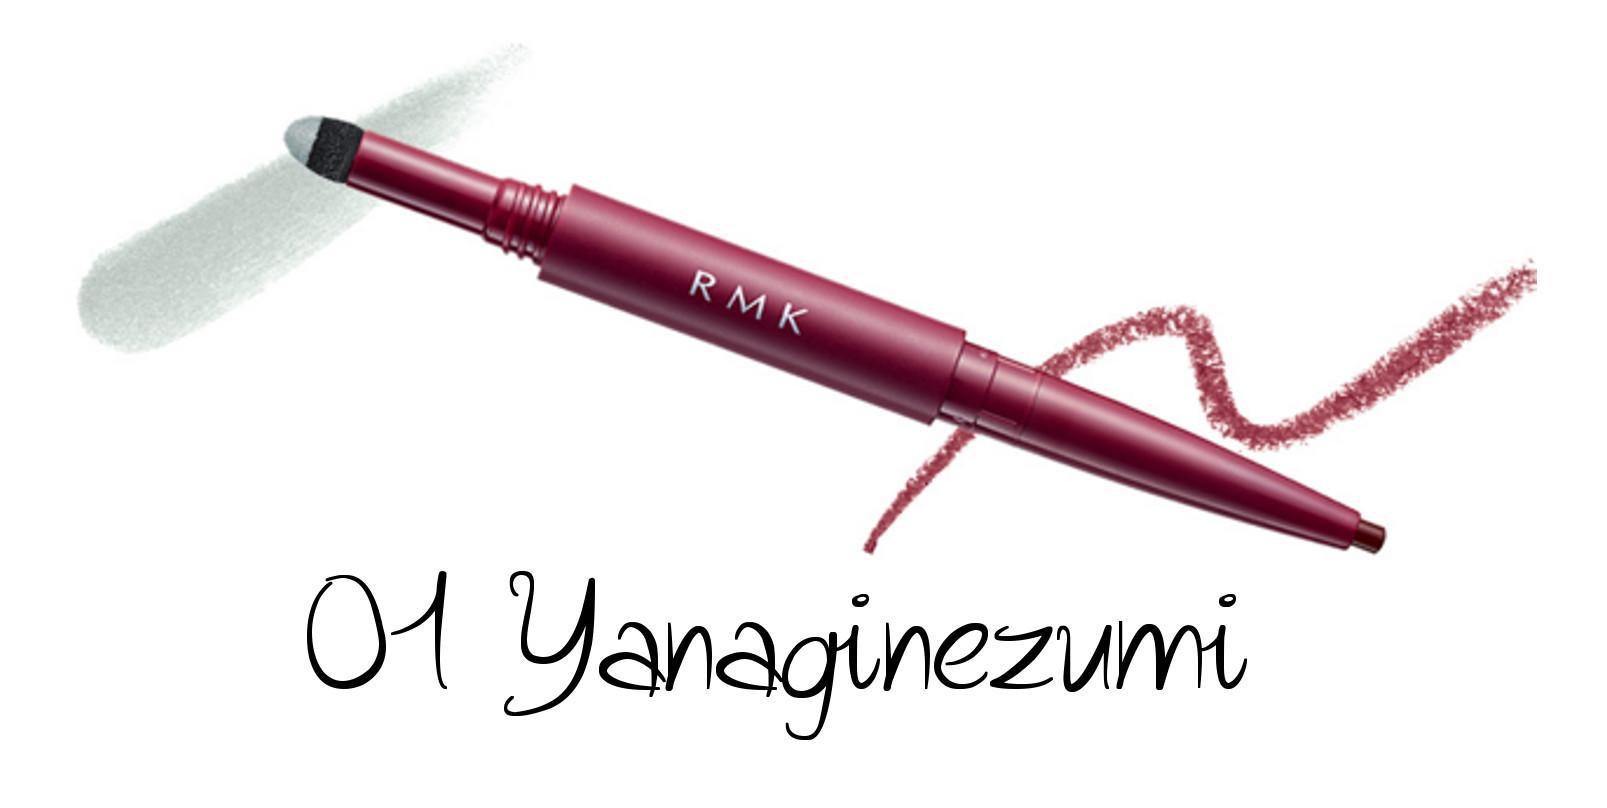 RMK Autumn Winter Collection 2020 Kiseru W Liner 01 Yanaginezumi